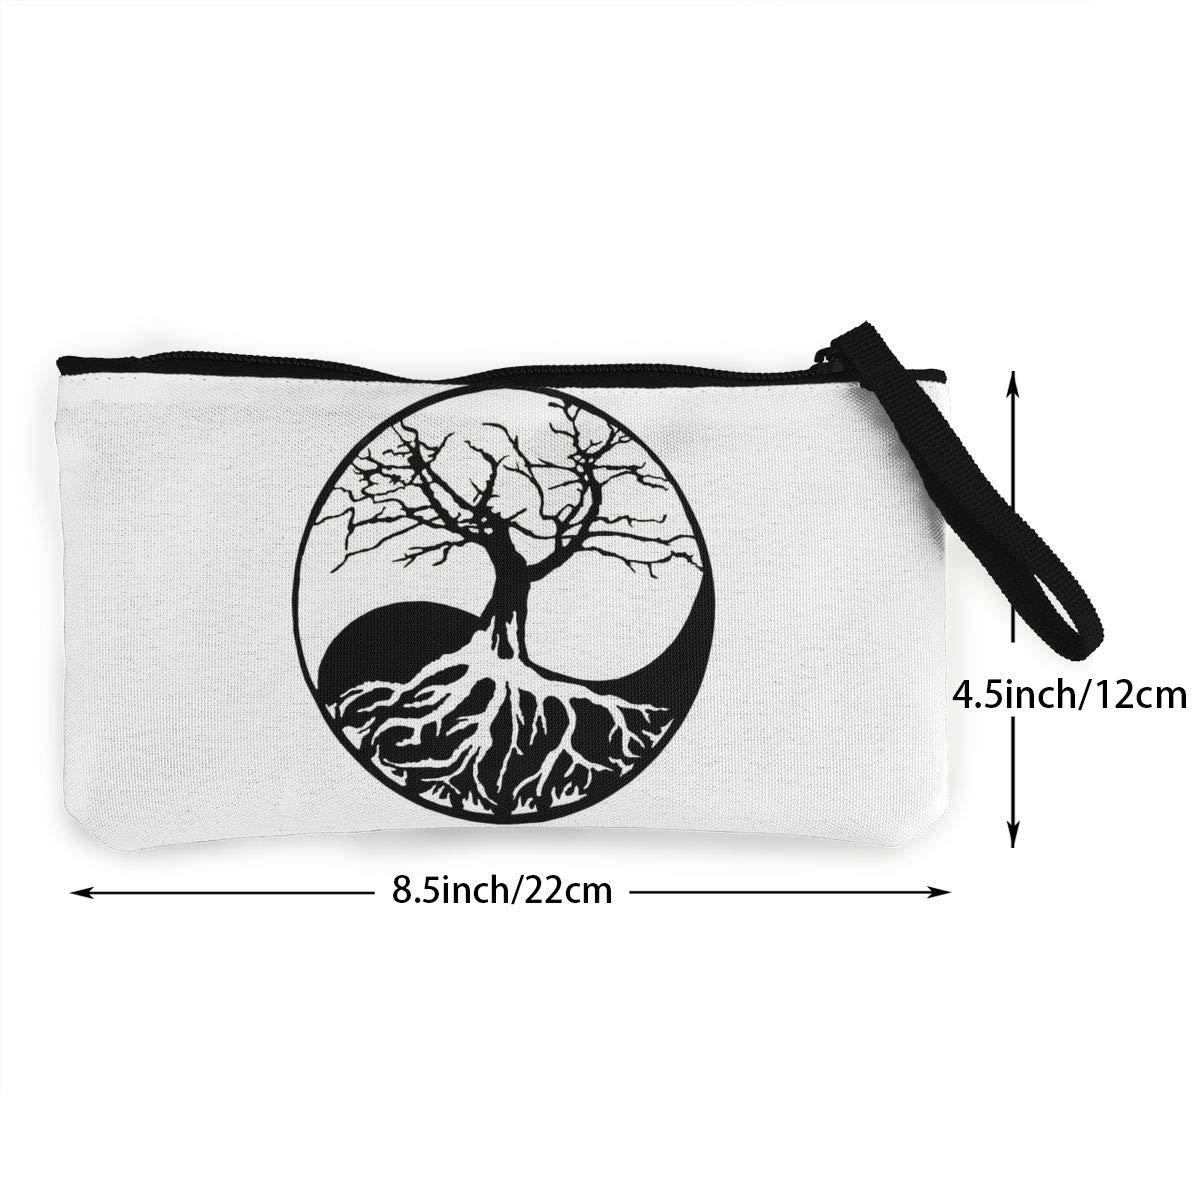 Canvas Cash Coin Purse,Yin Yang Bonsai Tree Print Make Up Bag Zipper Small Purse Wallets